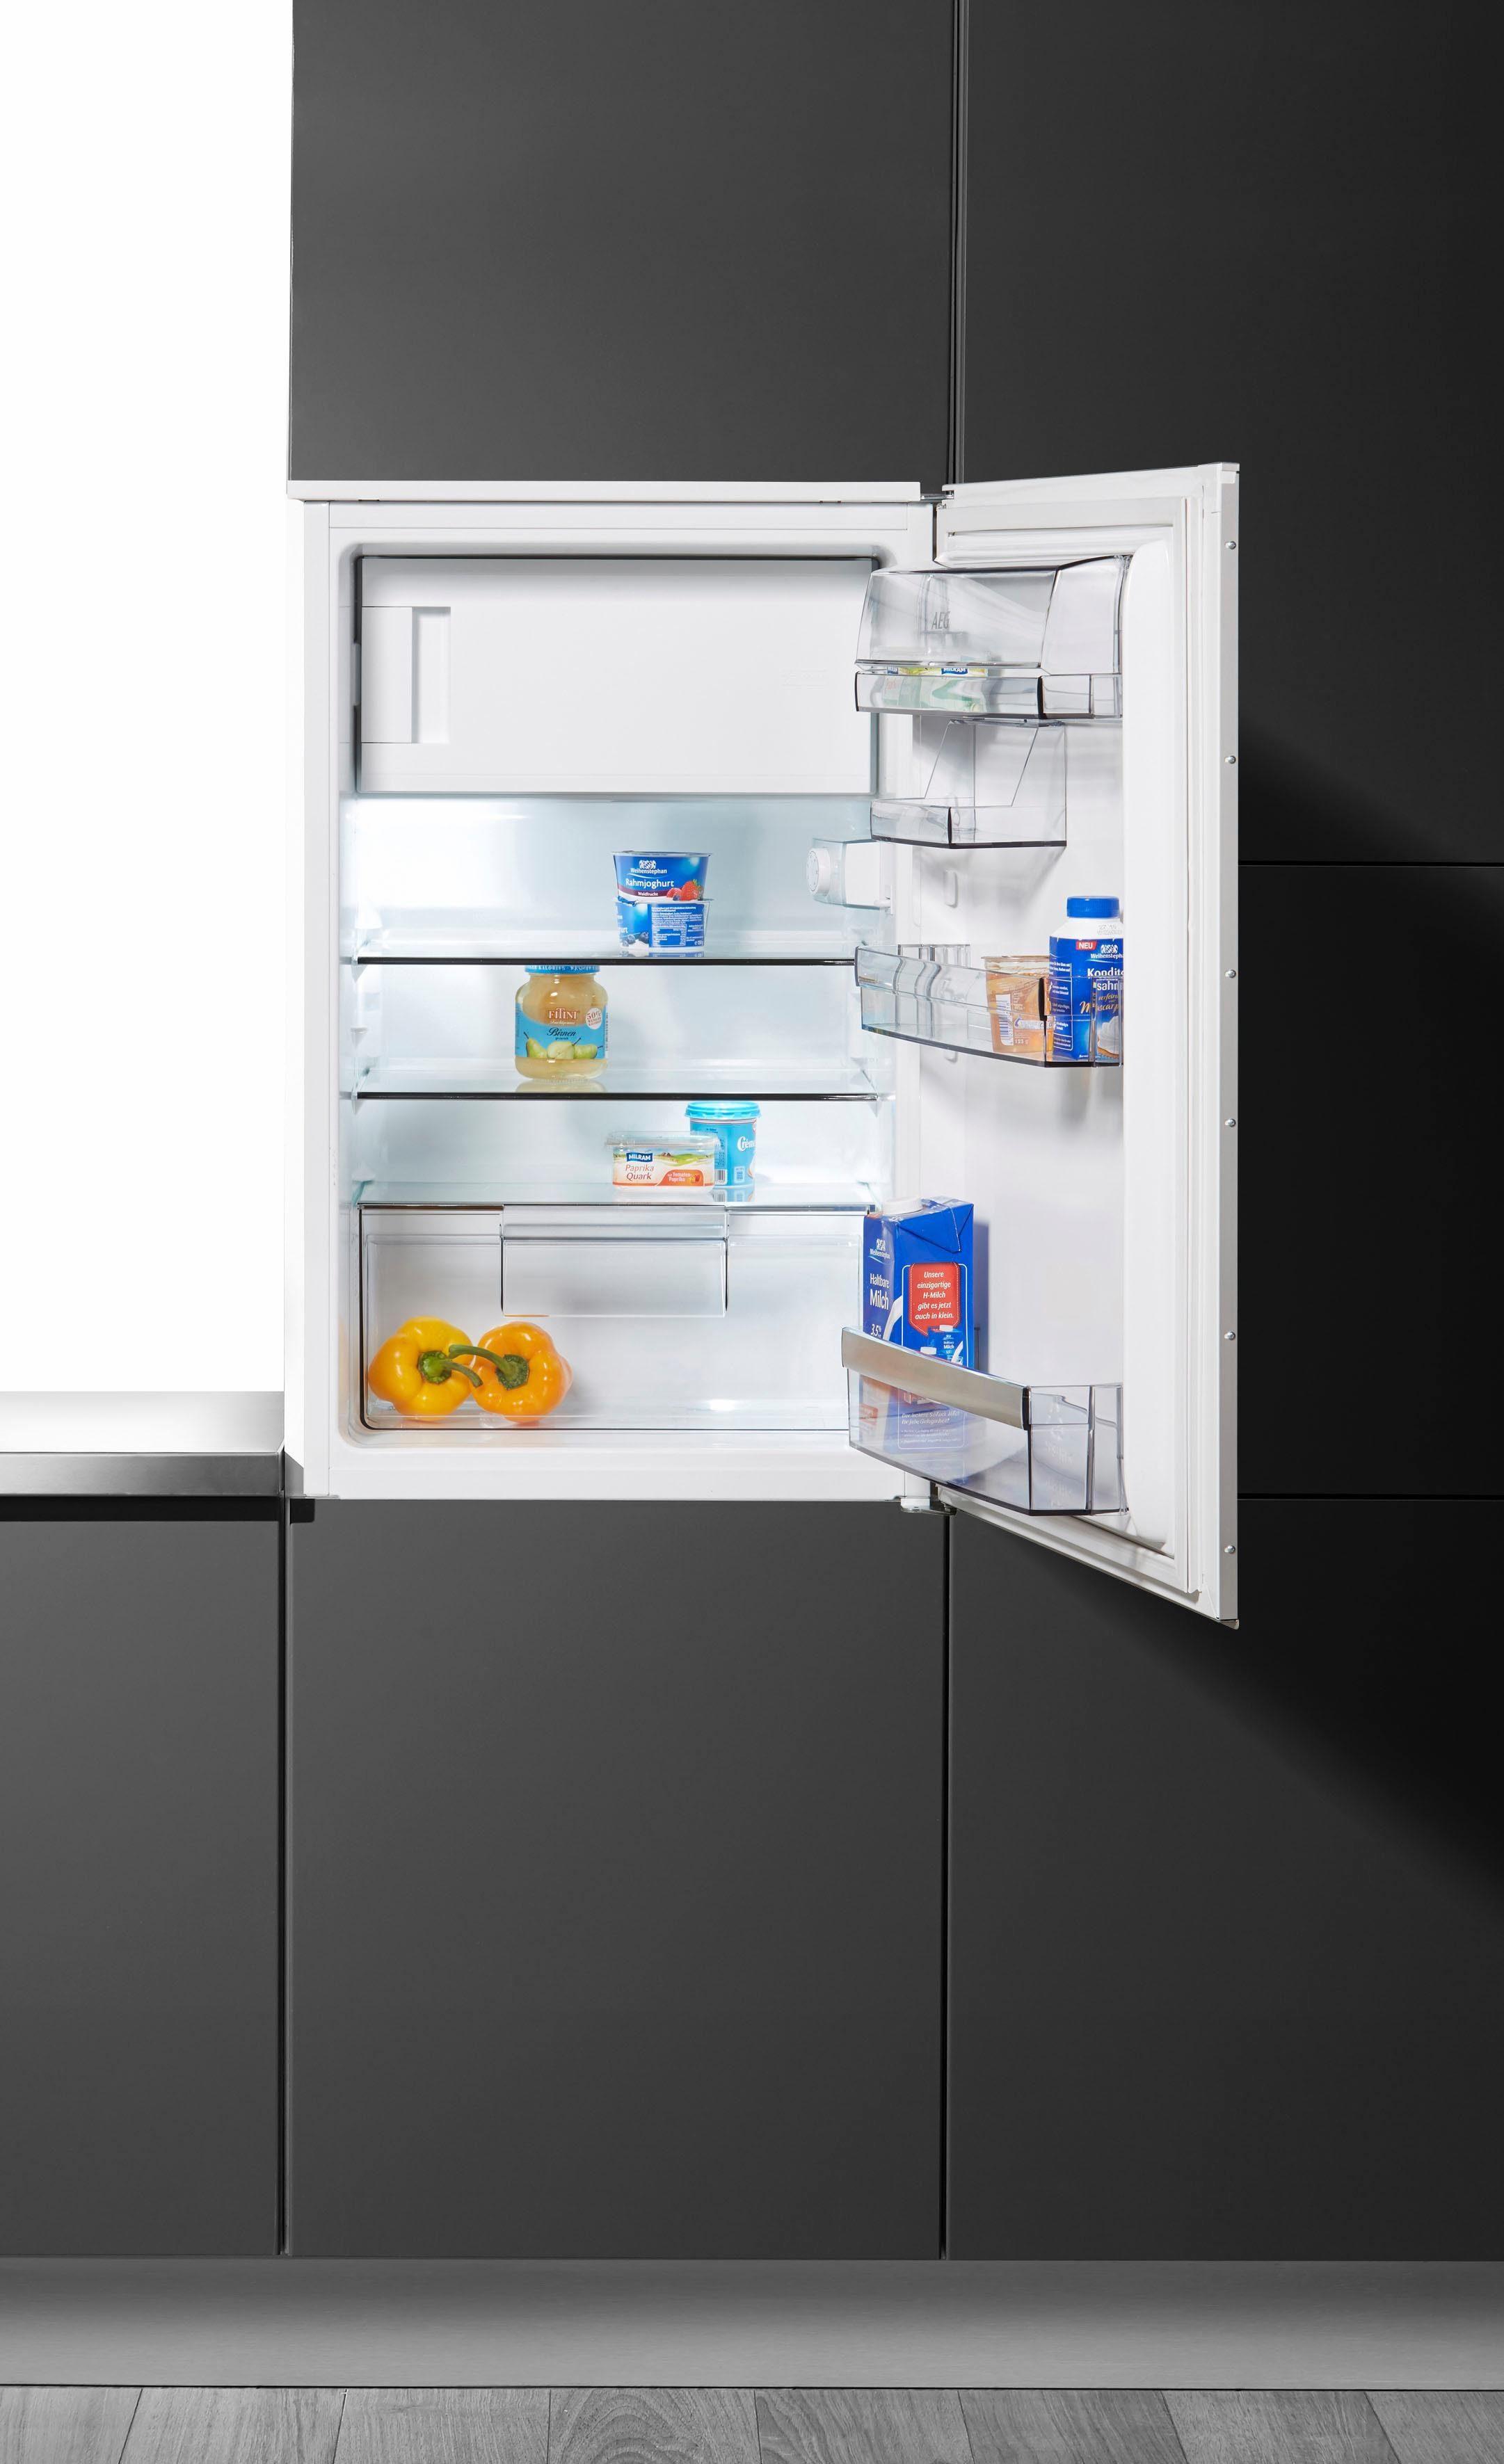 AEG Einbaukühlschrank SANTO SFB58821AE, 87,3 cm hoch, 54,0 cm breit, Energieklasse A++, 88,0 cm hoch